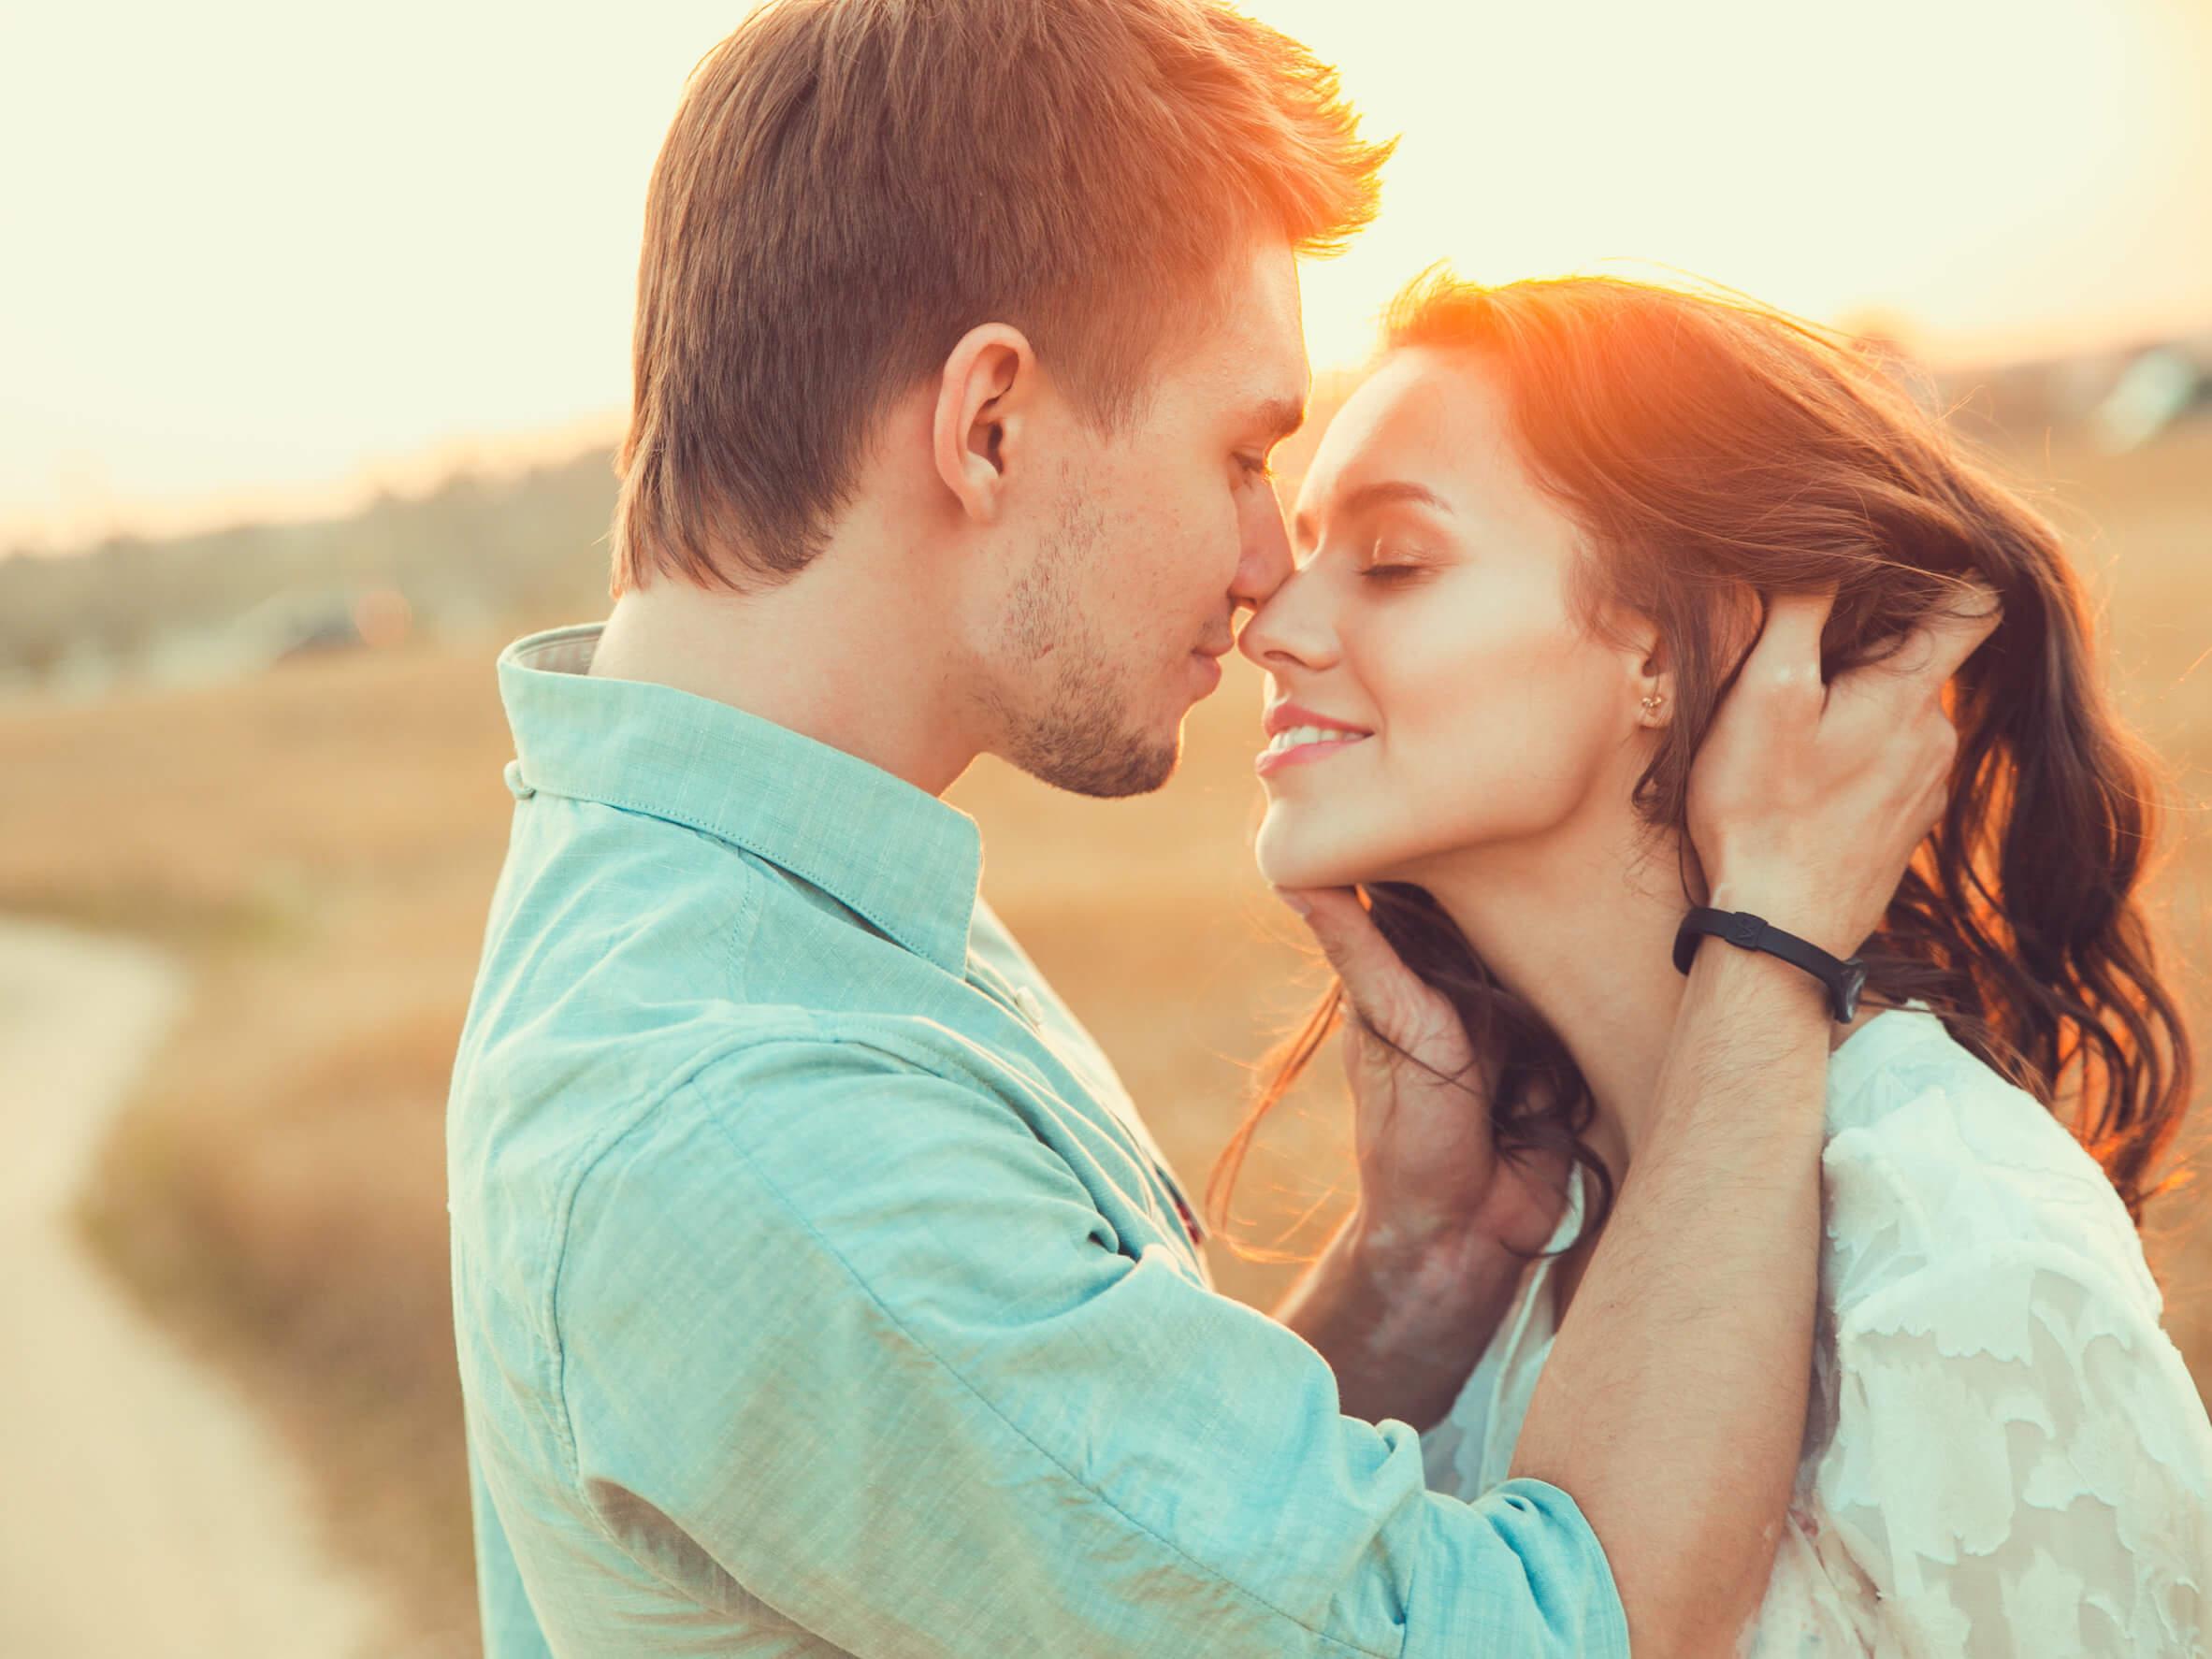 Verdades brutalmente honestas del amor que debes saber